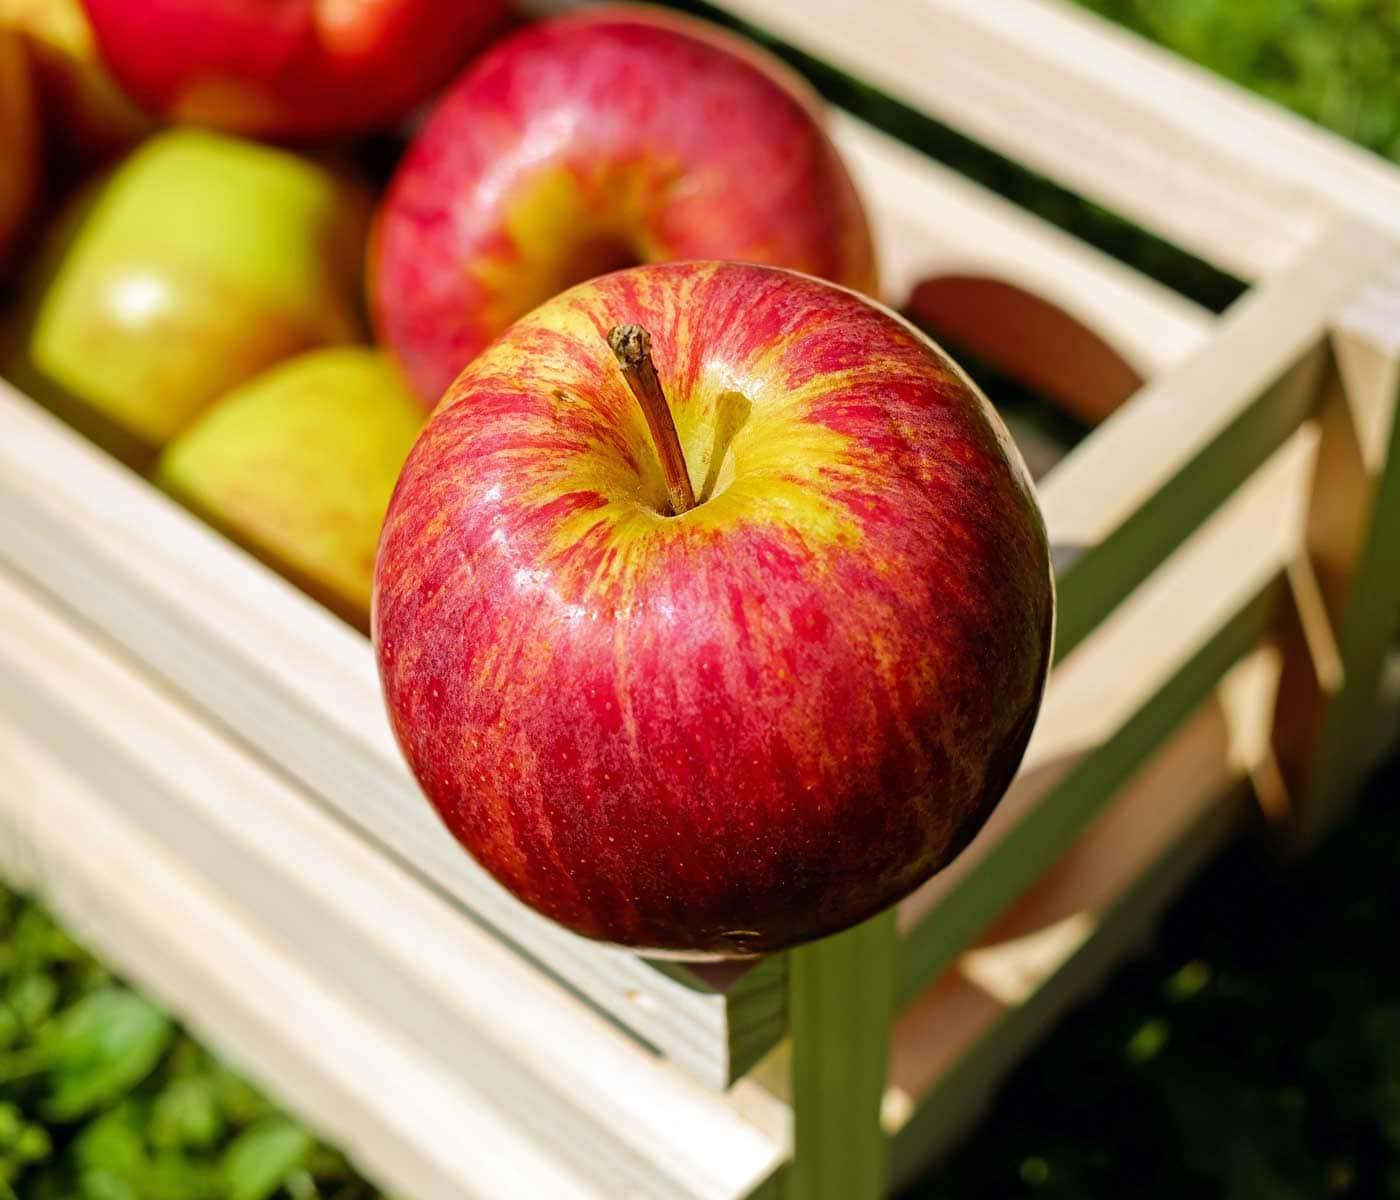 Apfelernte in Brandenburg: Kiste voller heimischer Äpfel mit Kindern ernten // HIMBEER